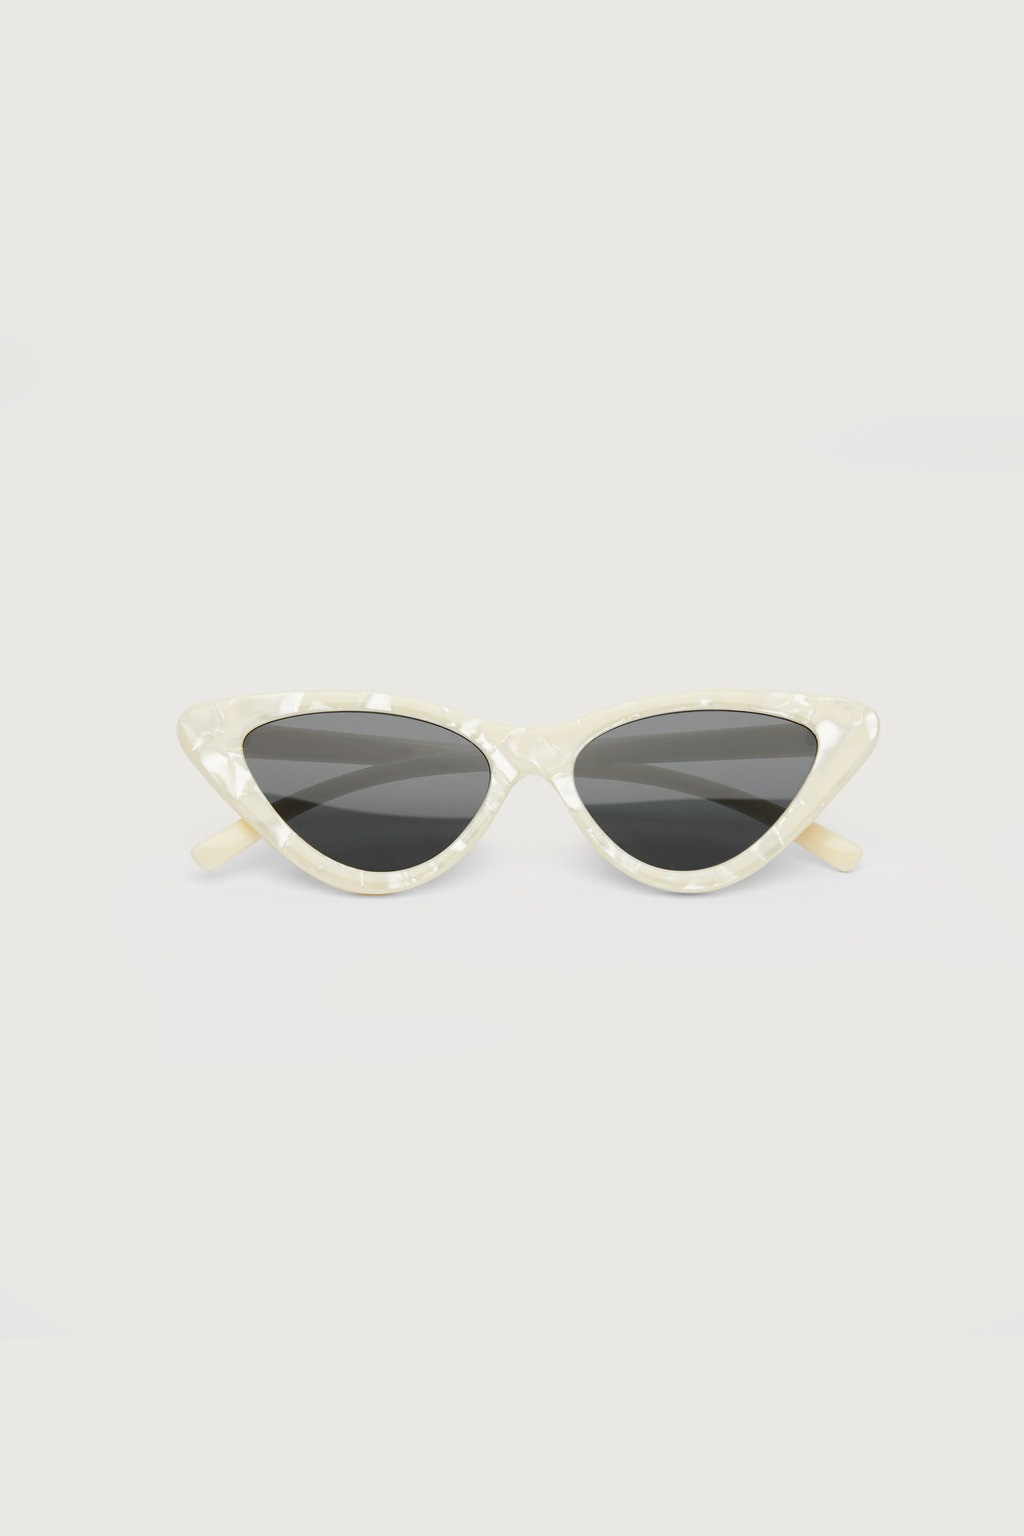 Sunglass 3369 Cream 4